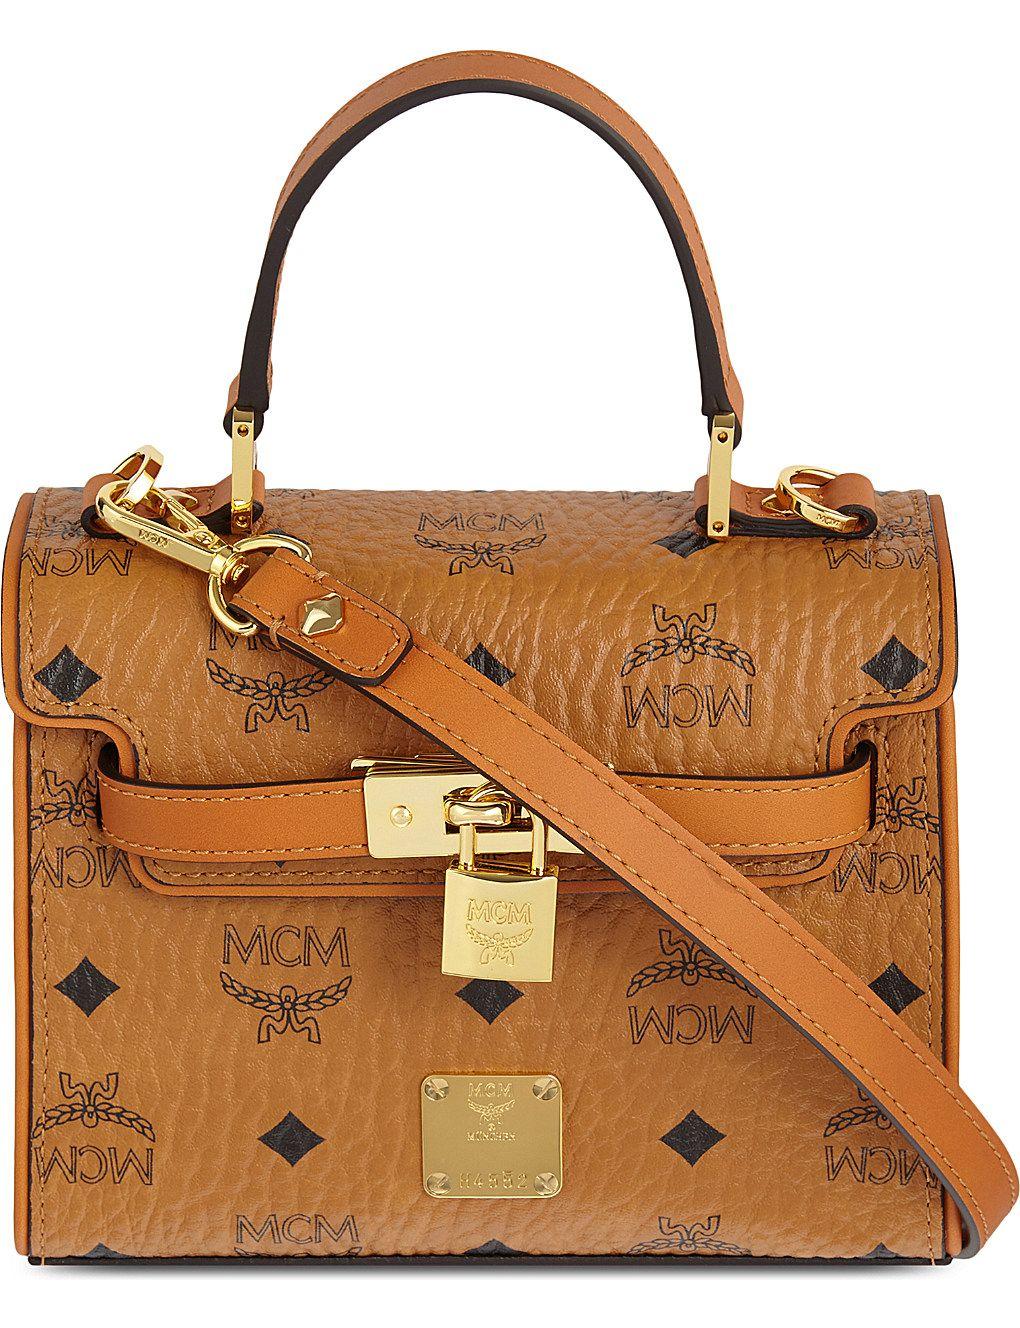 MCM Heritage padlock leather satchel | Leather satchel